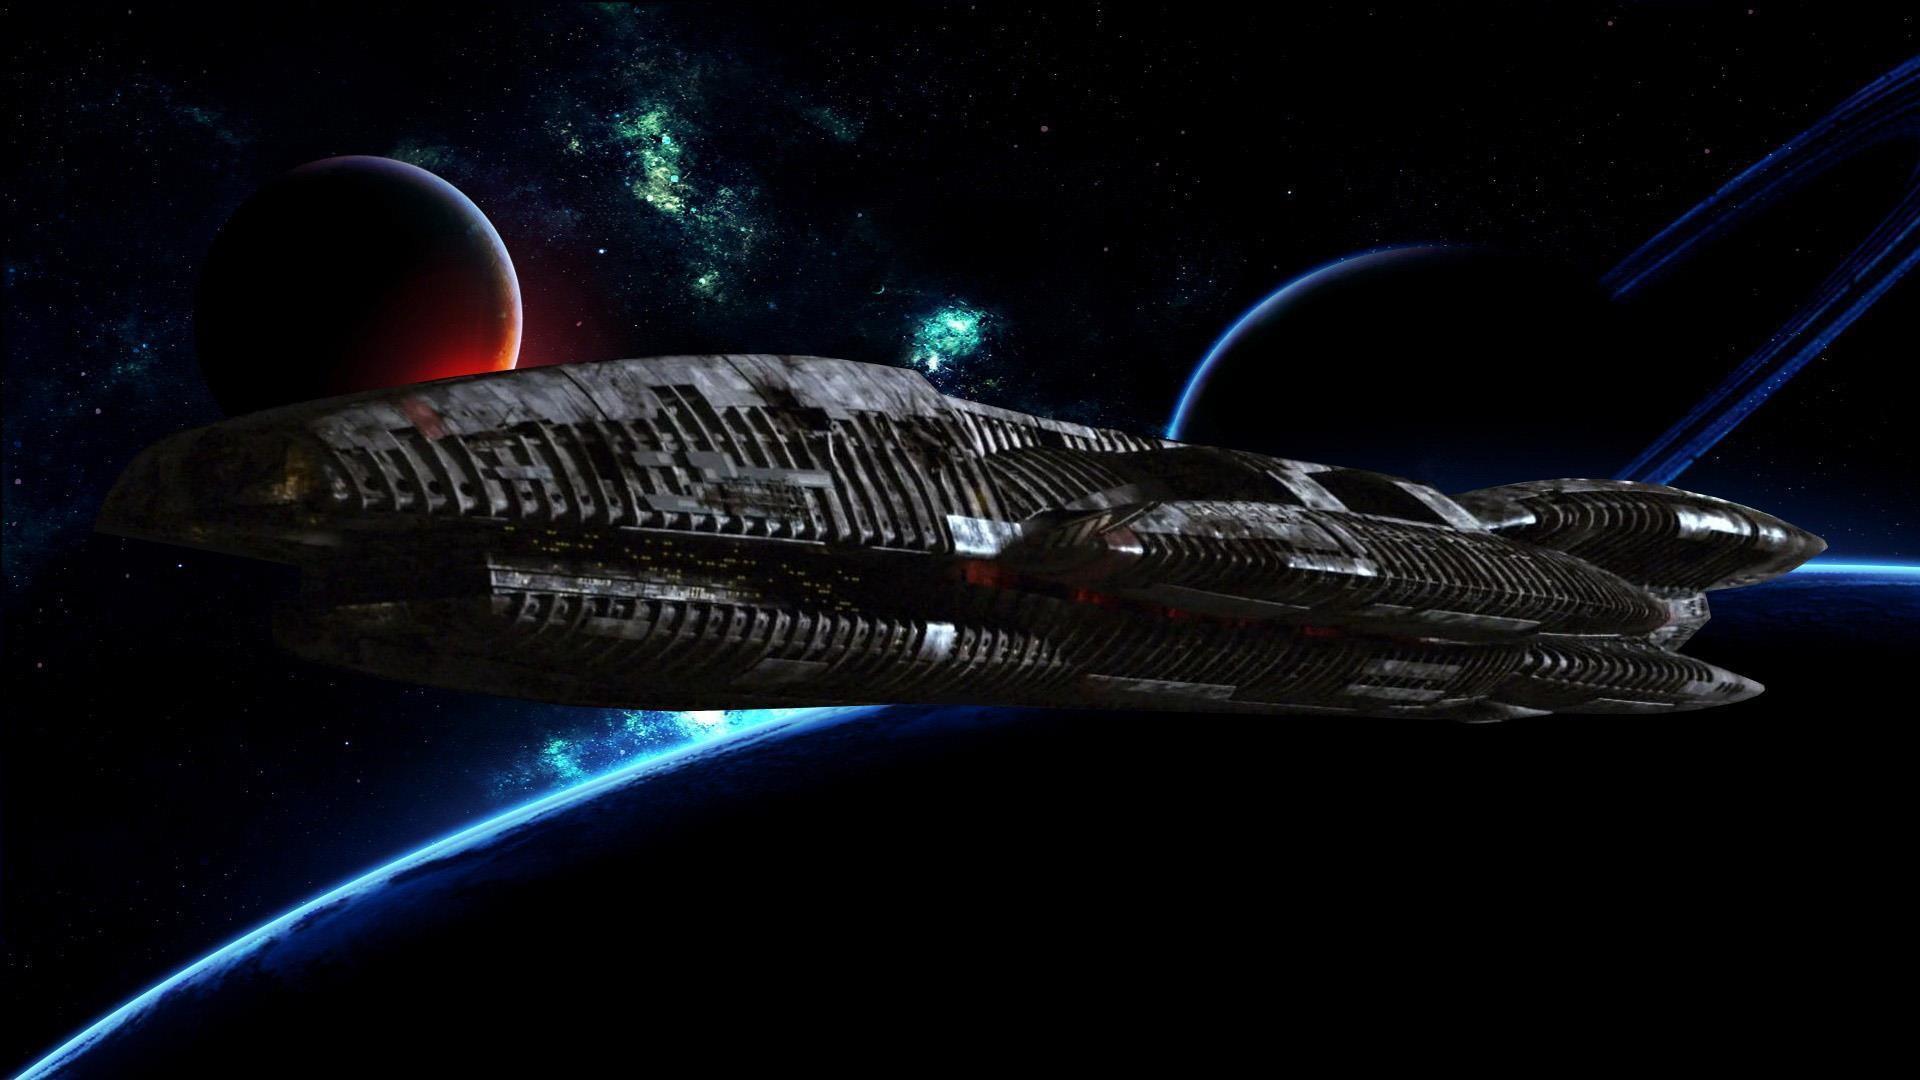 Battlestar Galactica Torrents Wallpaper